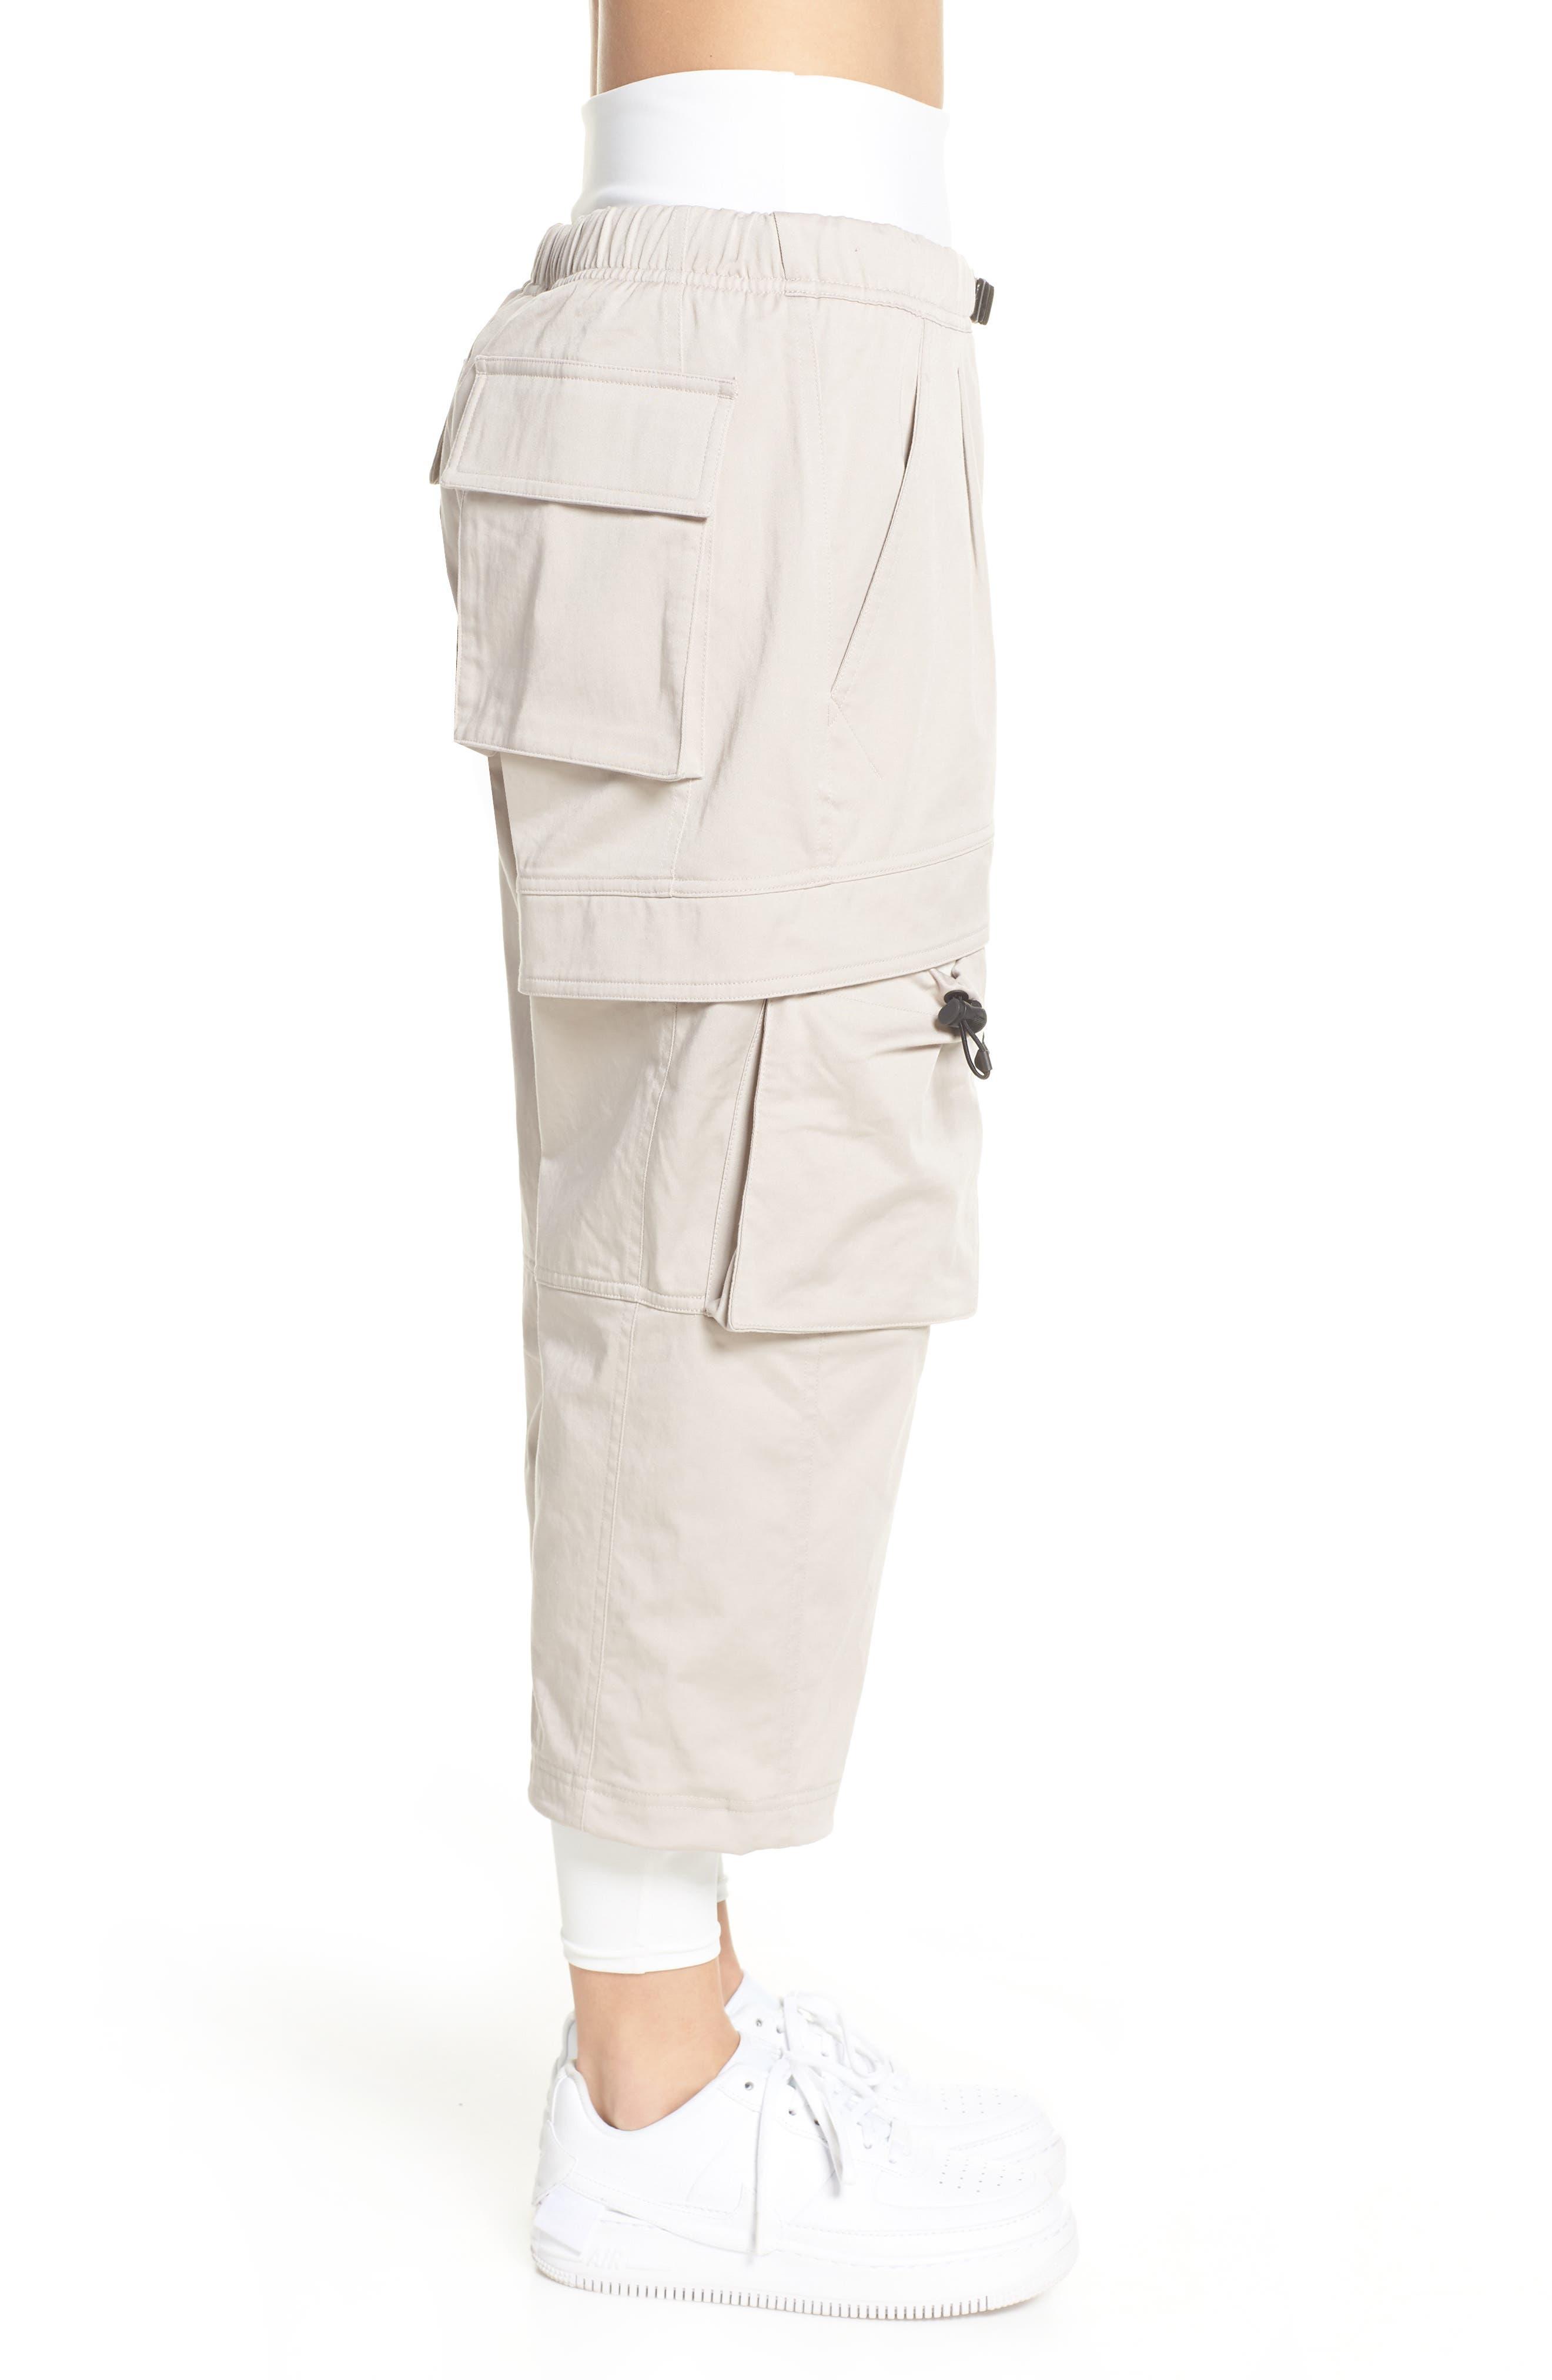 NIKE,                             ACG Women's Cargo Pants,                             Alternate thumbnail 4, color,                             MOON PARTICLE